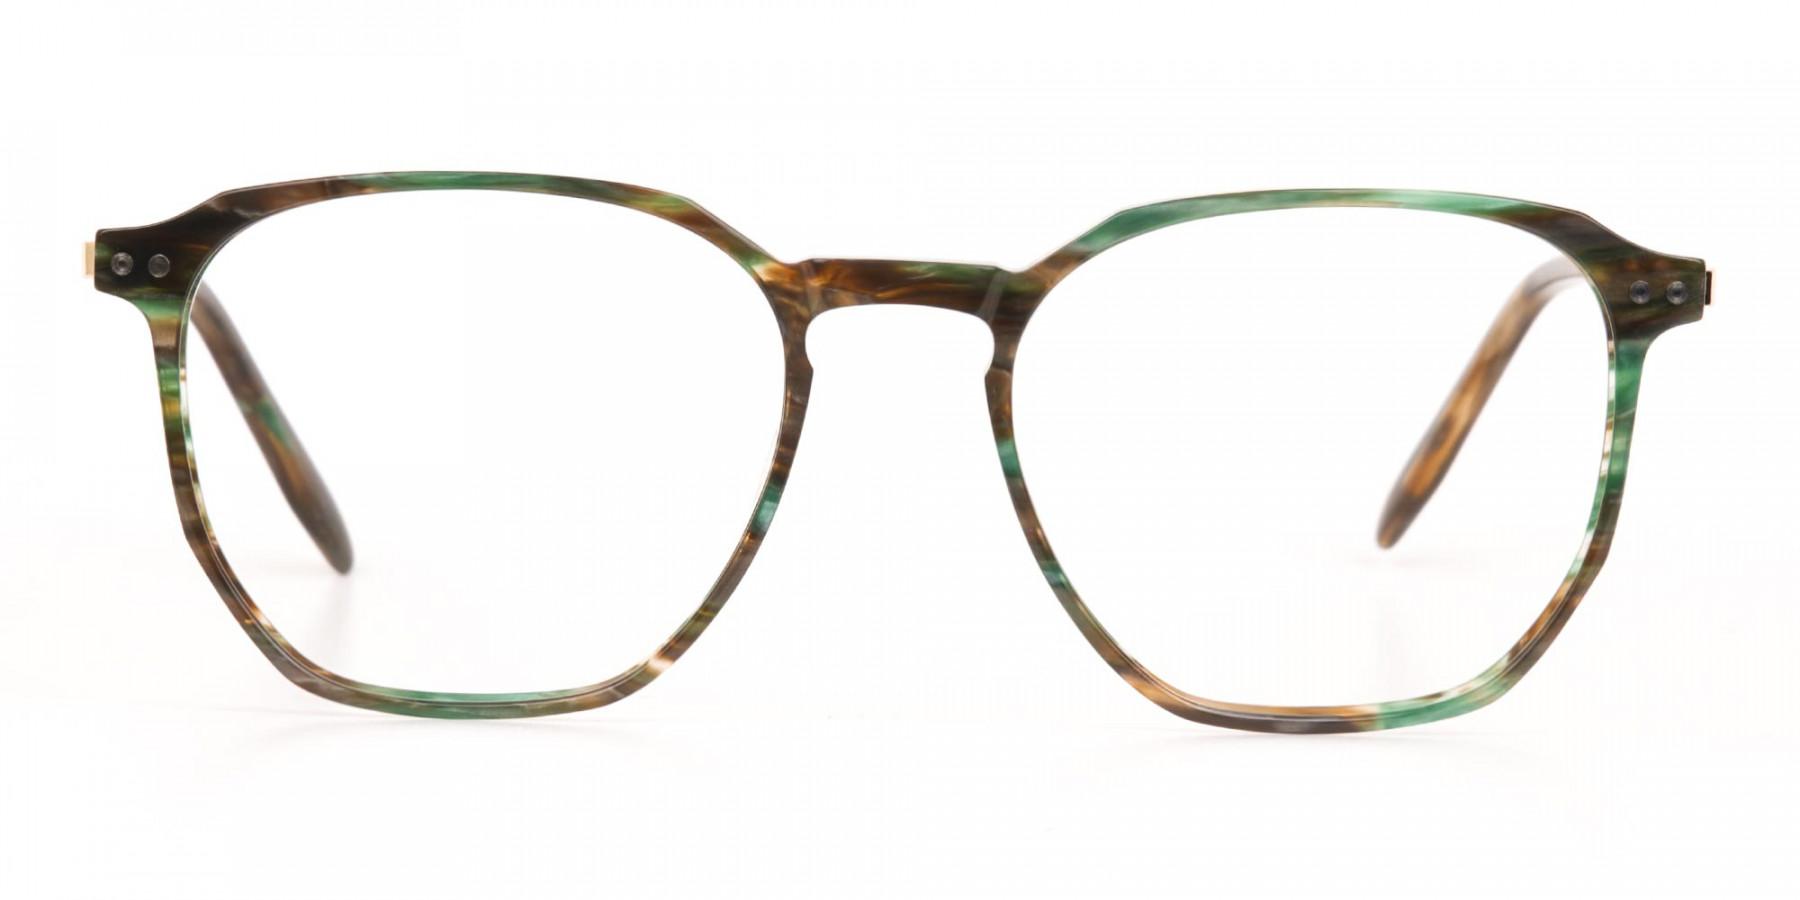 Jade Green & Brown, Gold Geometric Glasses-1